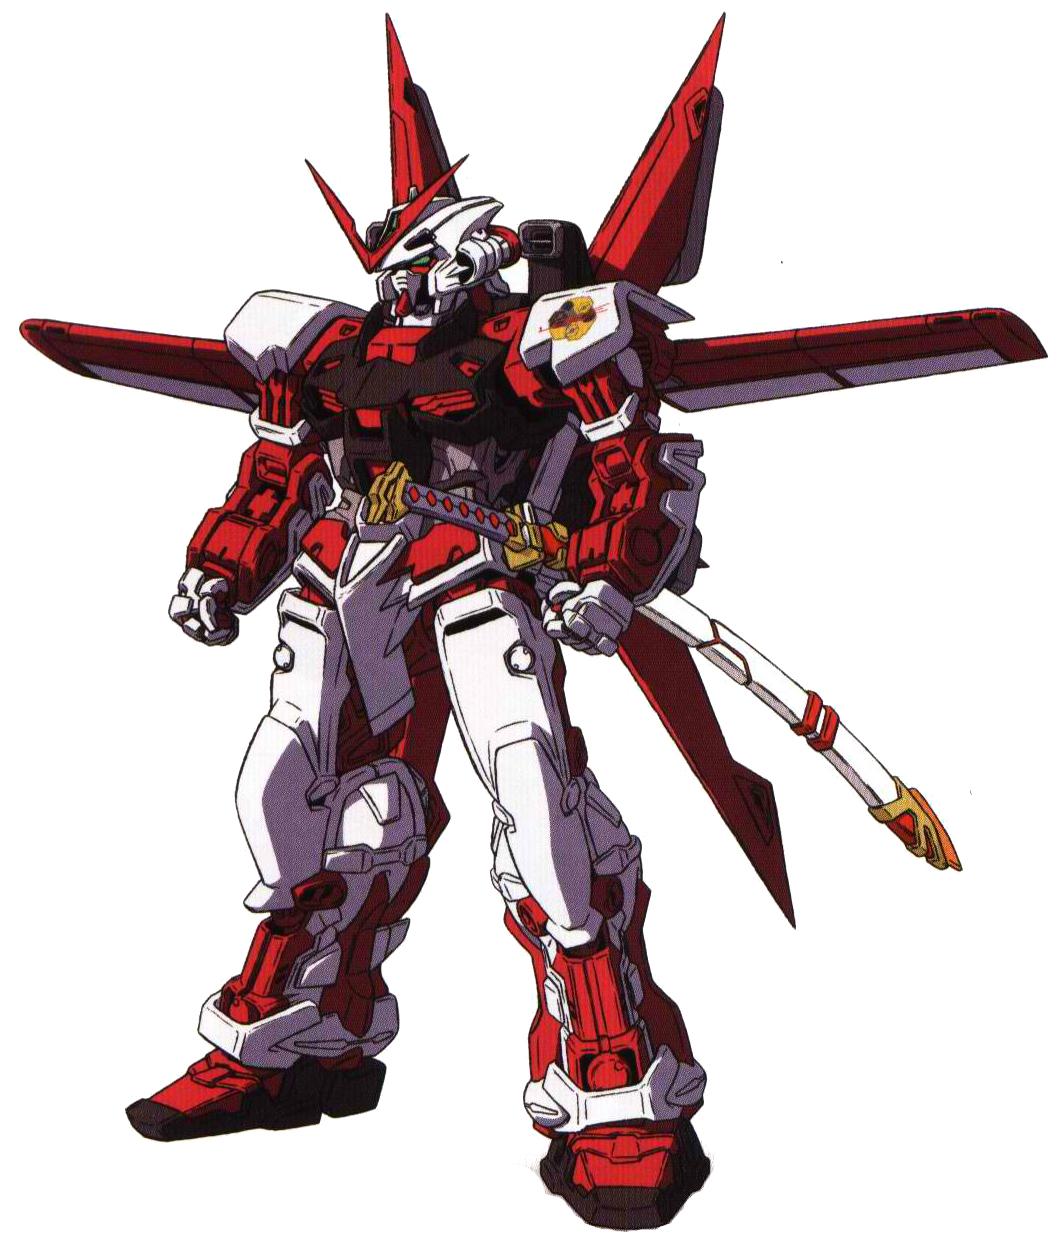 MBF-P02 Gundam Astray Red Frame